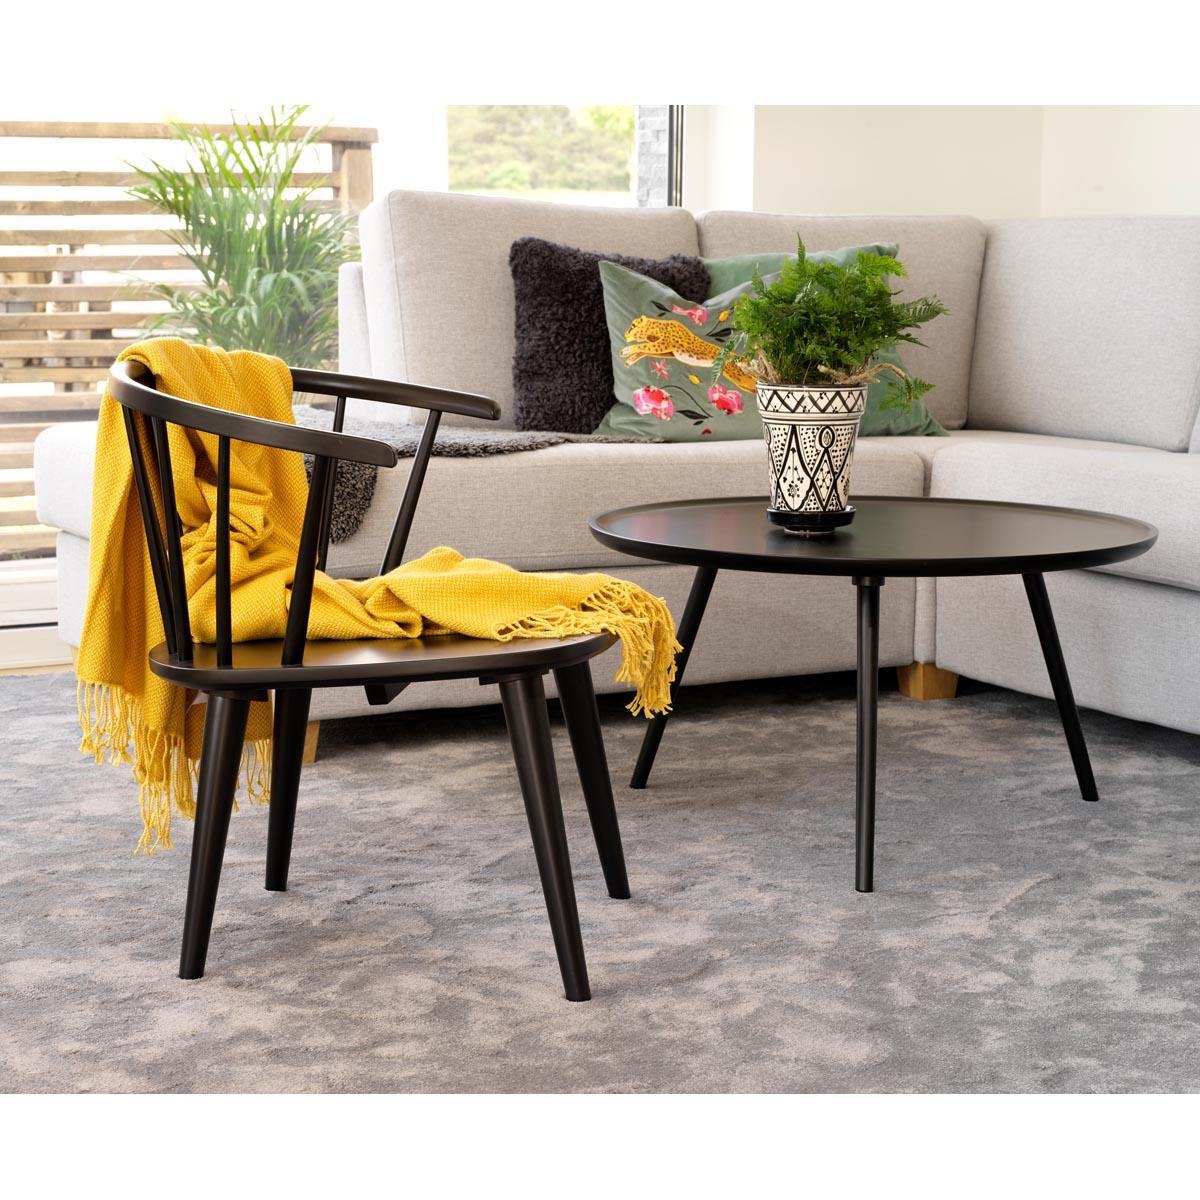 Grandpa-loungestol-svart-miljo-106242+Daisy-soffbord